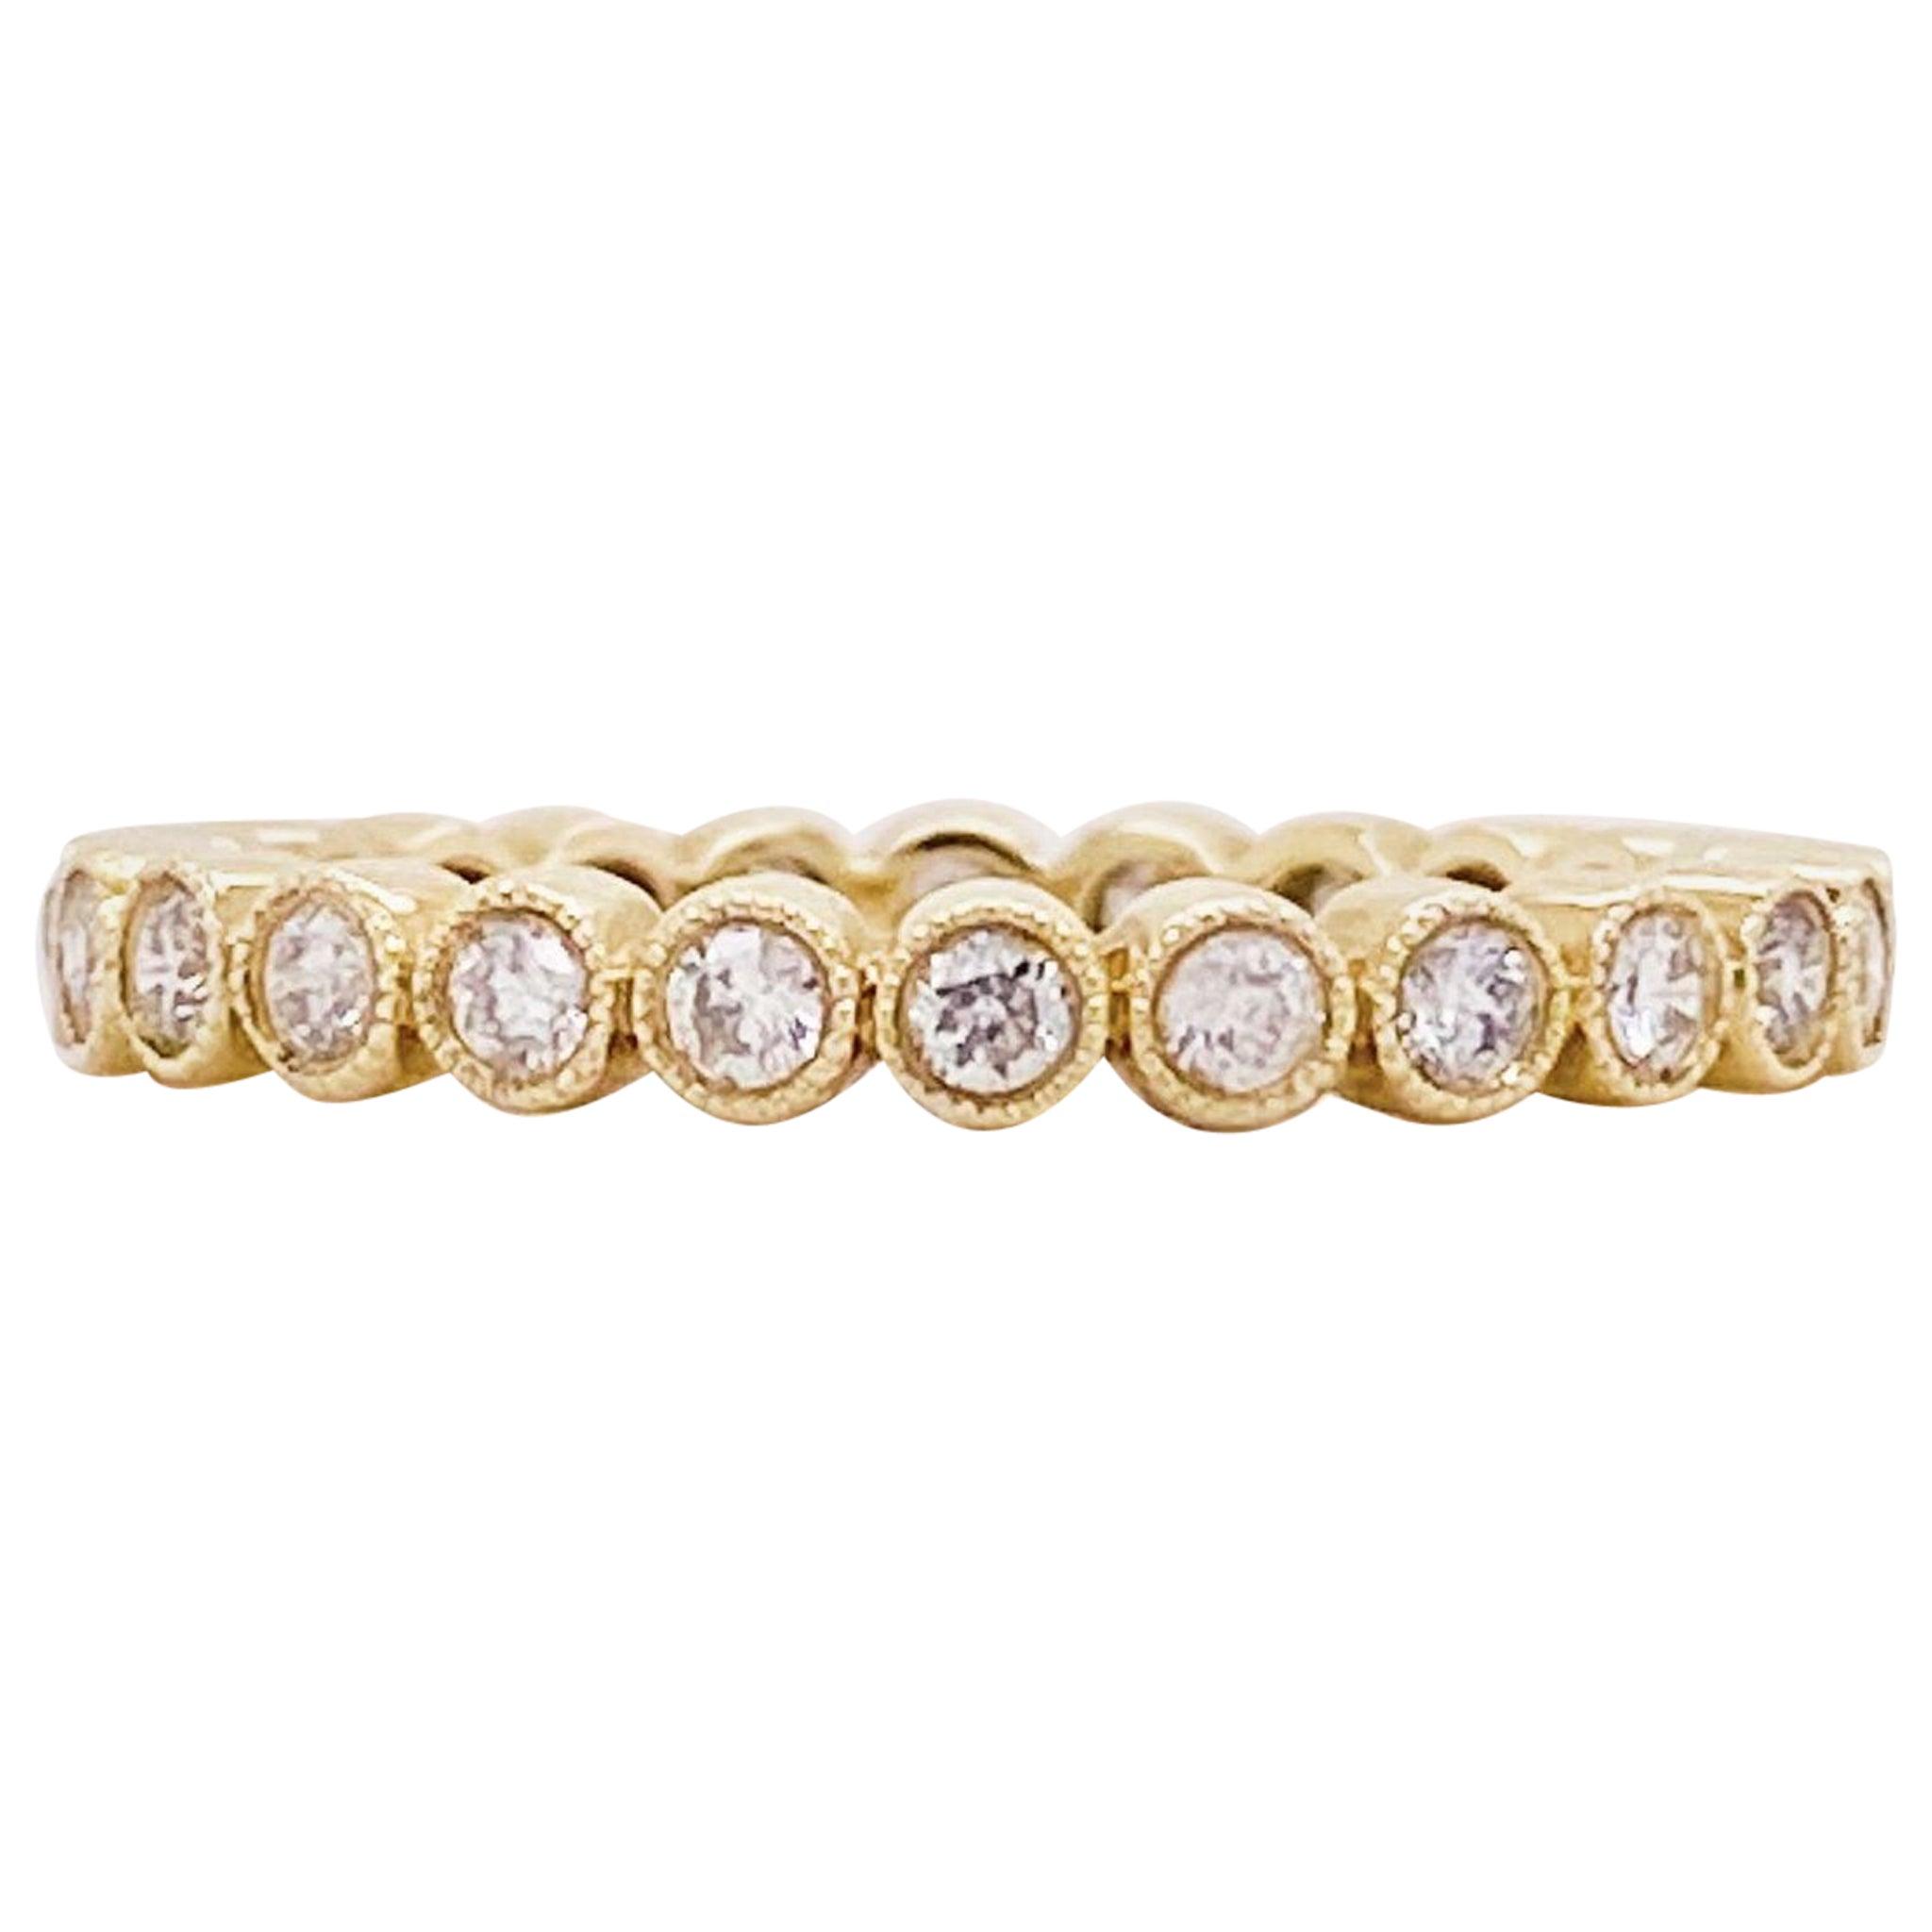 Diamond Bezel Eternity Band 14K Yellow Gold Stackable Half Carat Diamond Band